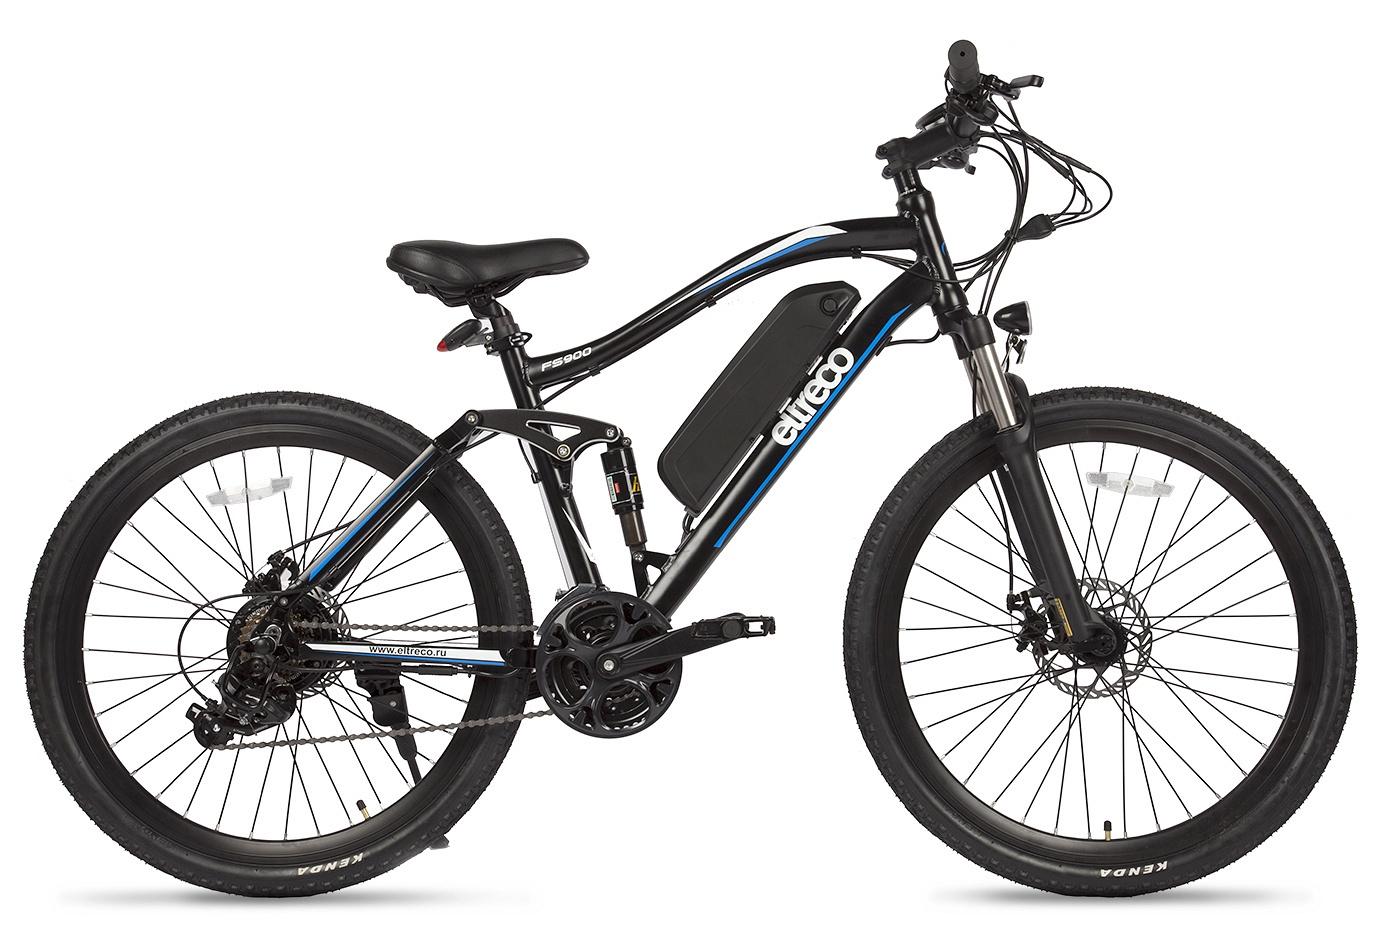 цена на Электровелосипед Eltreco FS 900 26, 010830